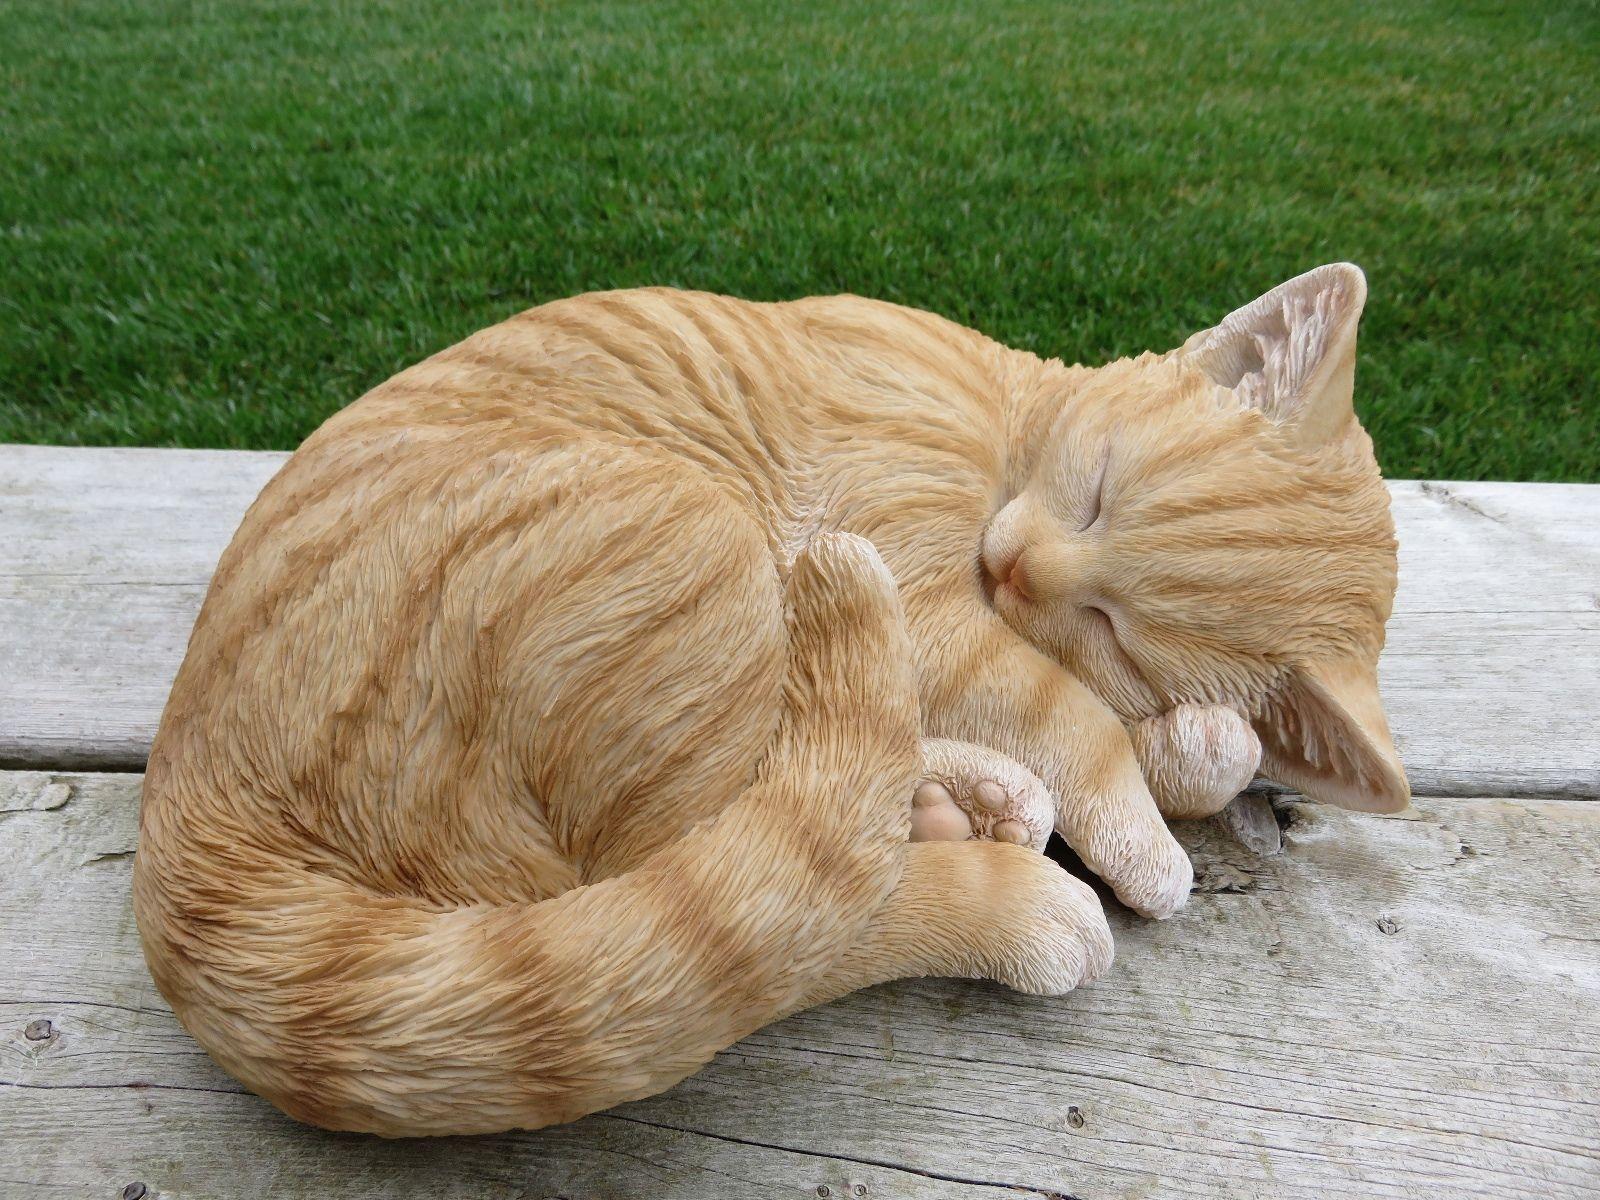 Orange Tabby Cat Figurine Kitten Lying Down Curled Up Animal Farm Resin Feline Size 11 0x8 5x4 5 Tabby Cat Cats Orange Tabby Cats